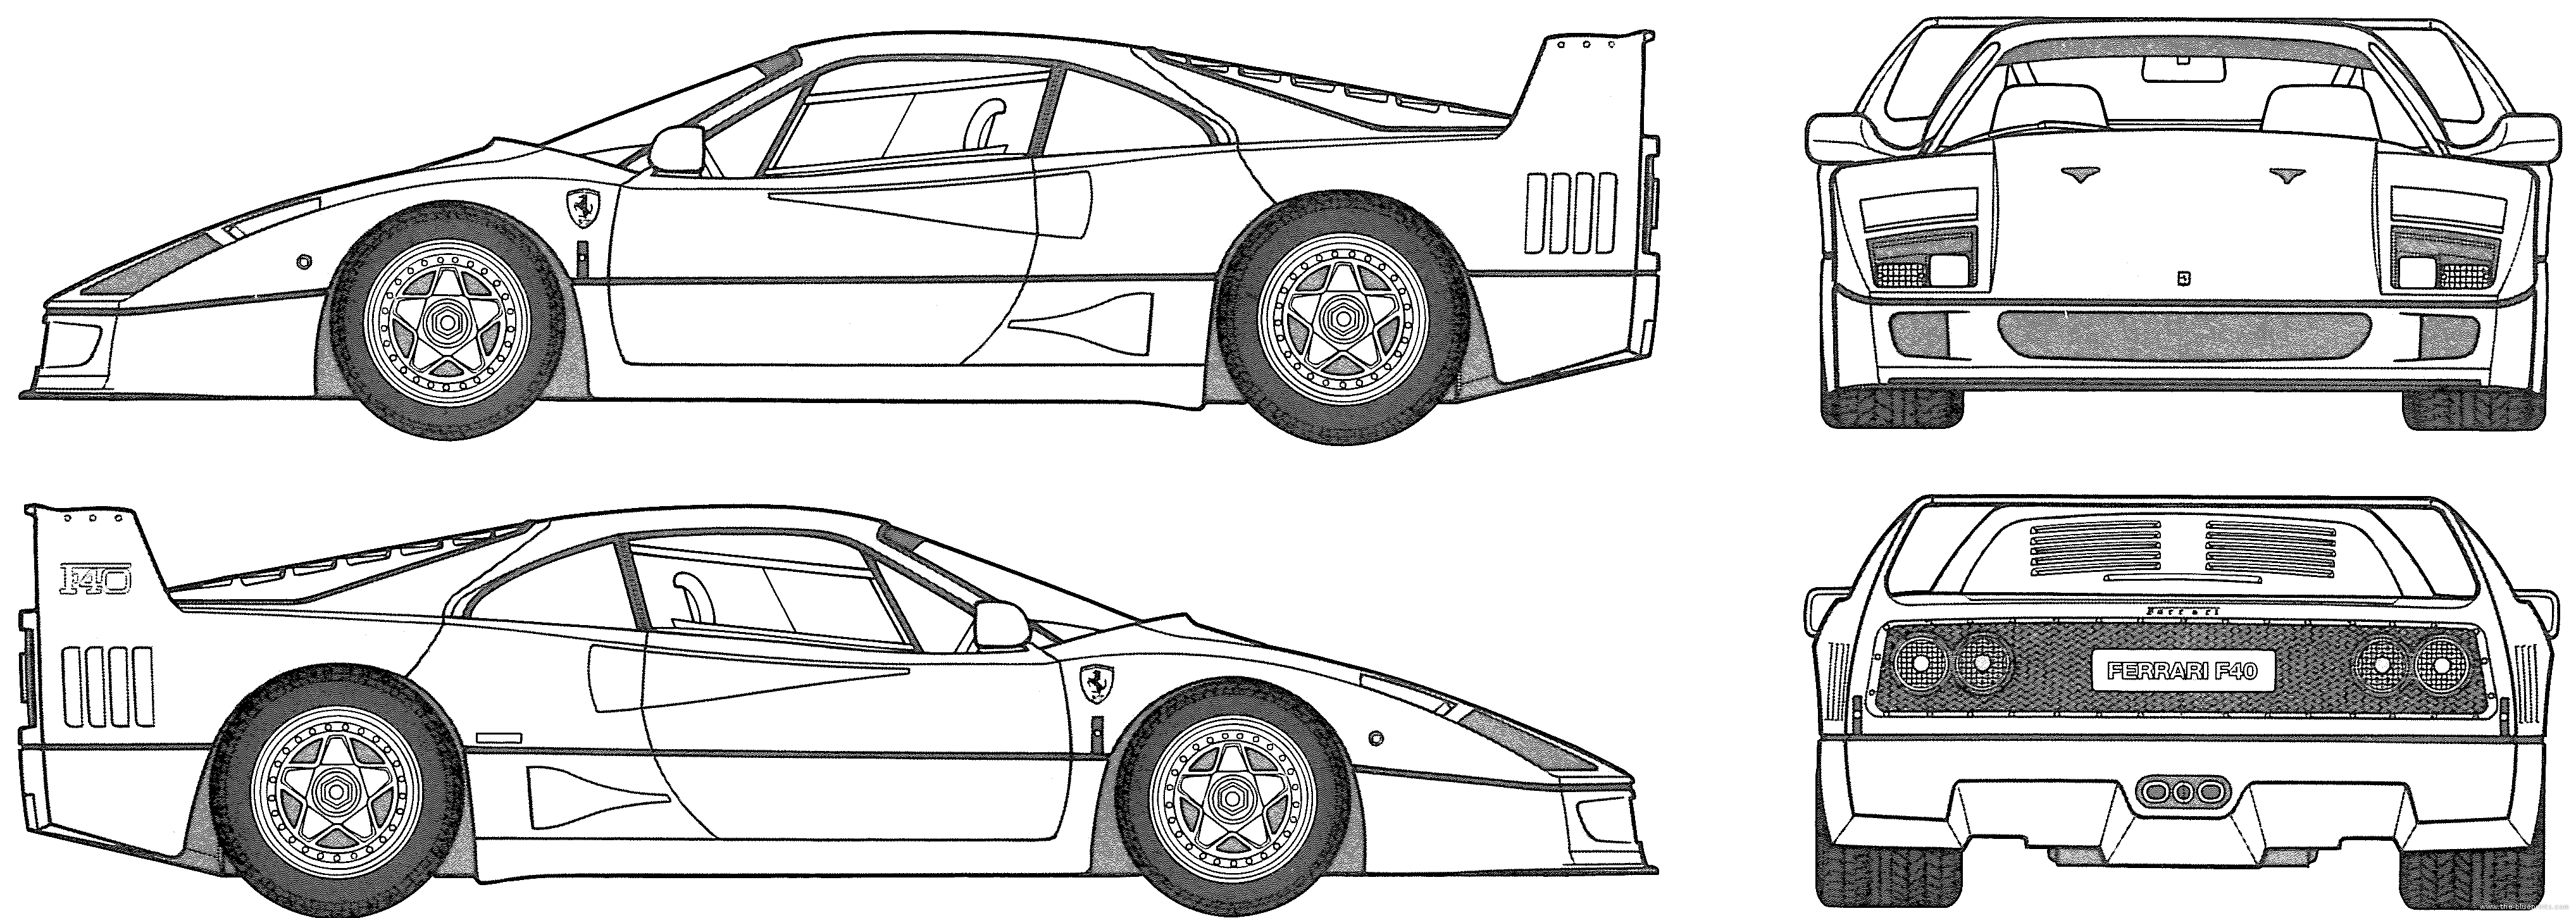 Ferrari f40 dimensions